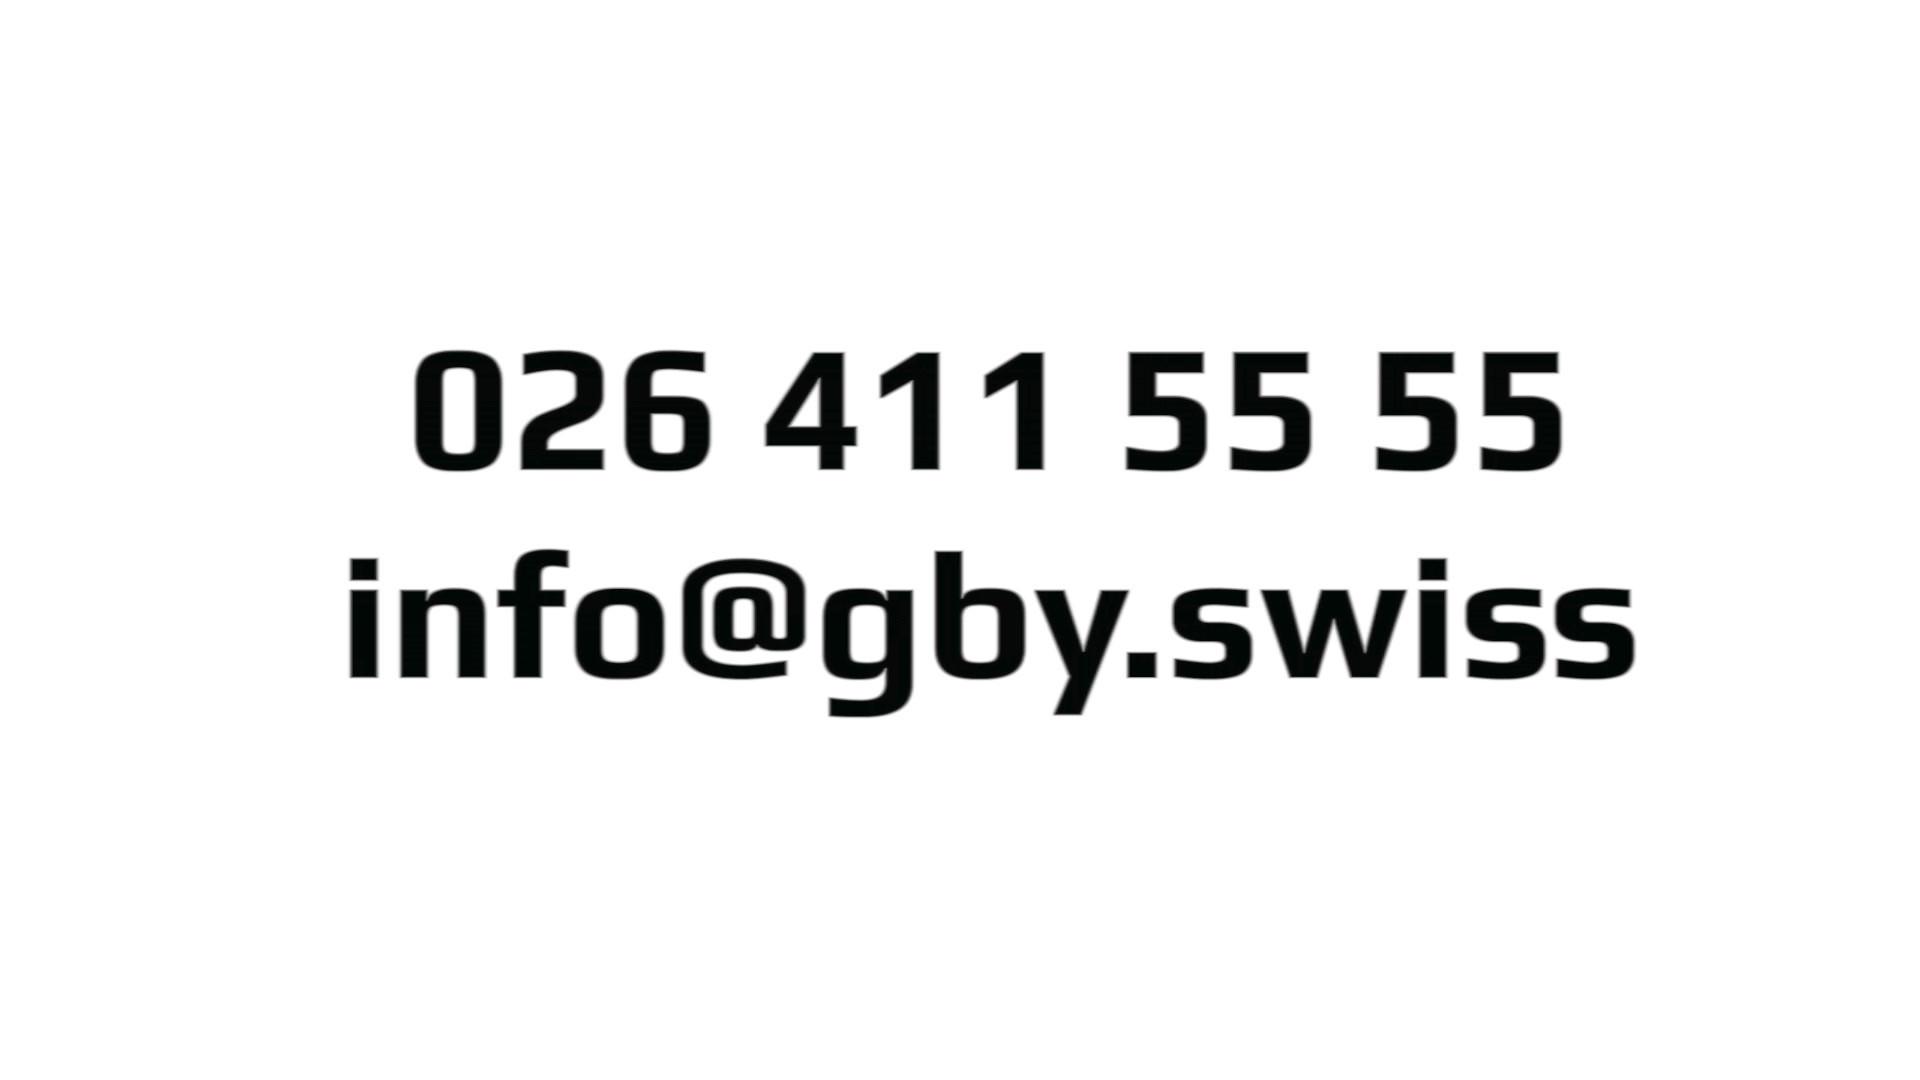 gby.swiss video